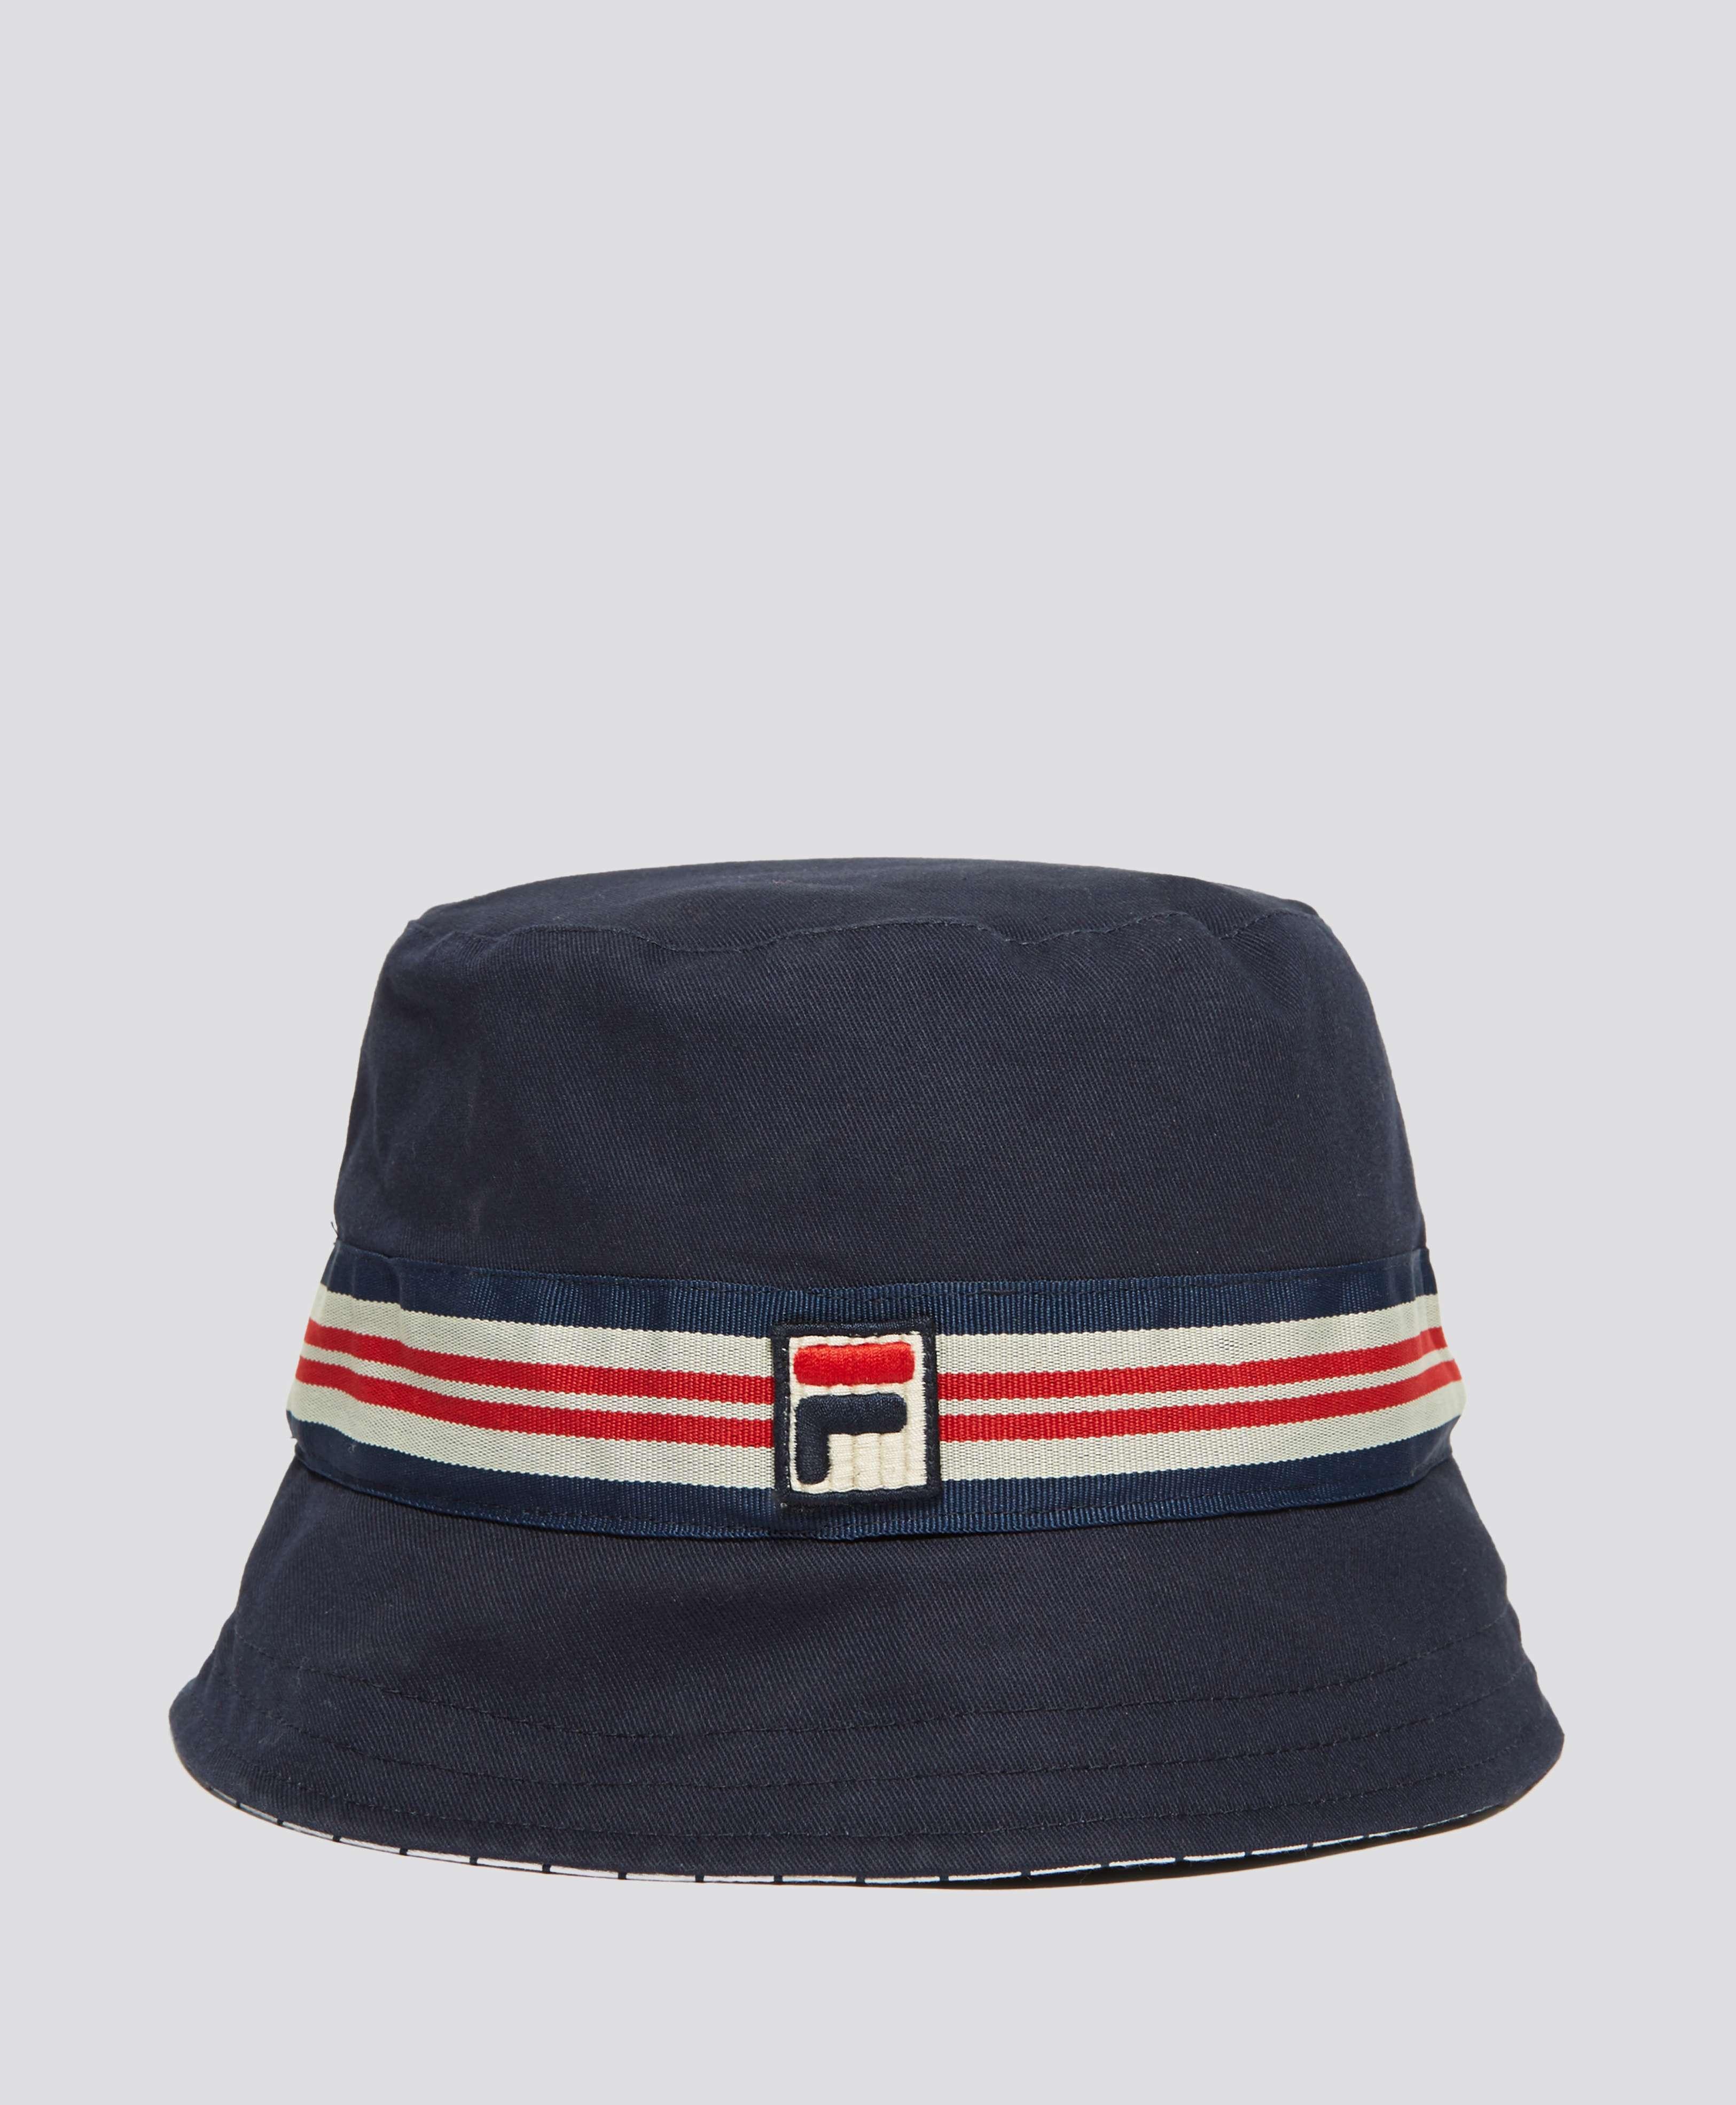 87092f2bc29 Fila Classic Reversible Bucket Hat - Exclusive